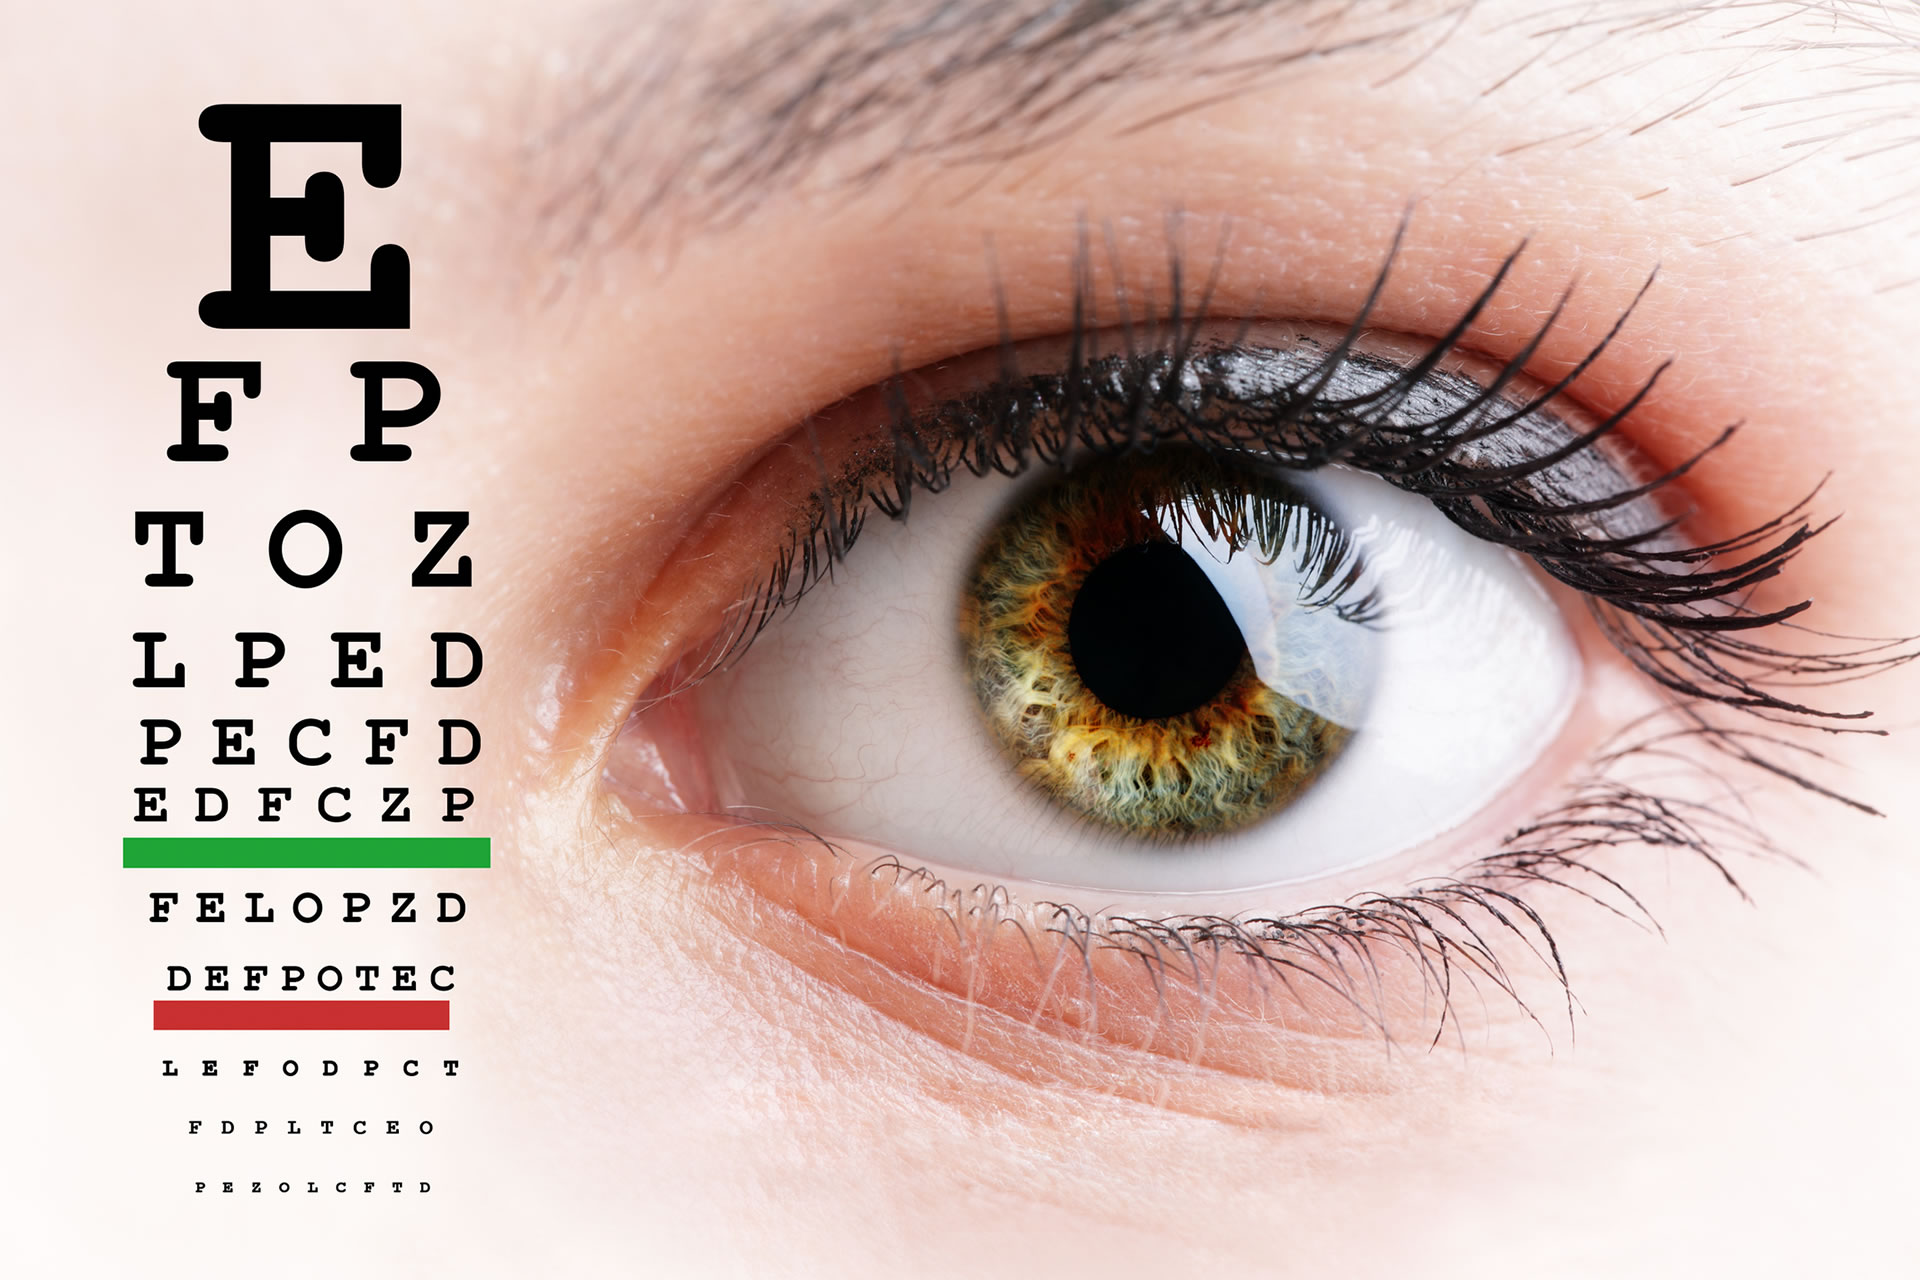 A Focused Vision On Eye Health